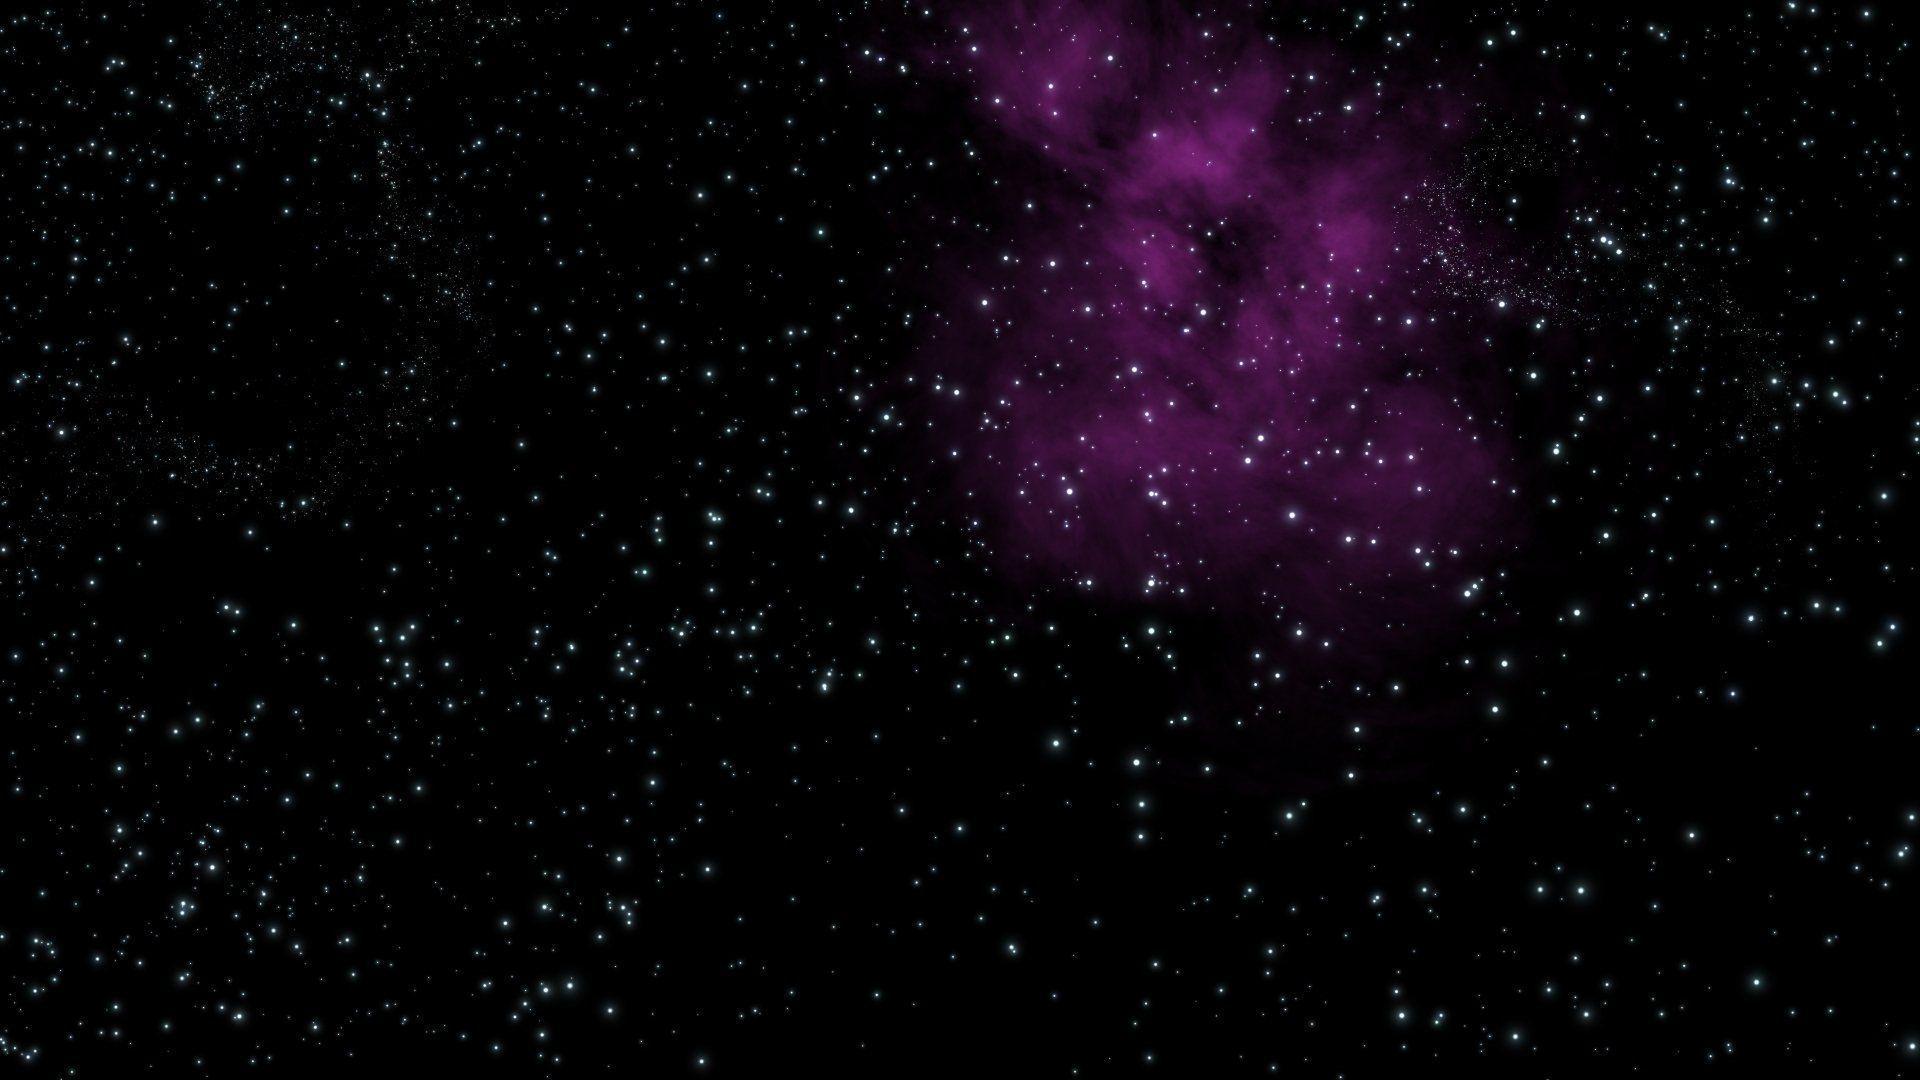 space black aesthetic - HD1920×1080